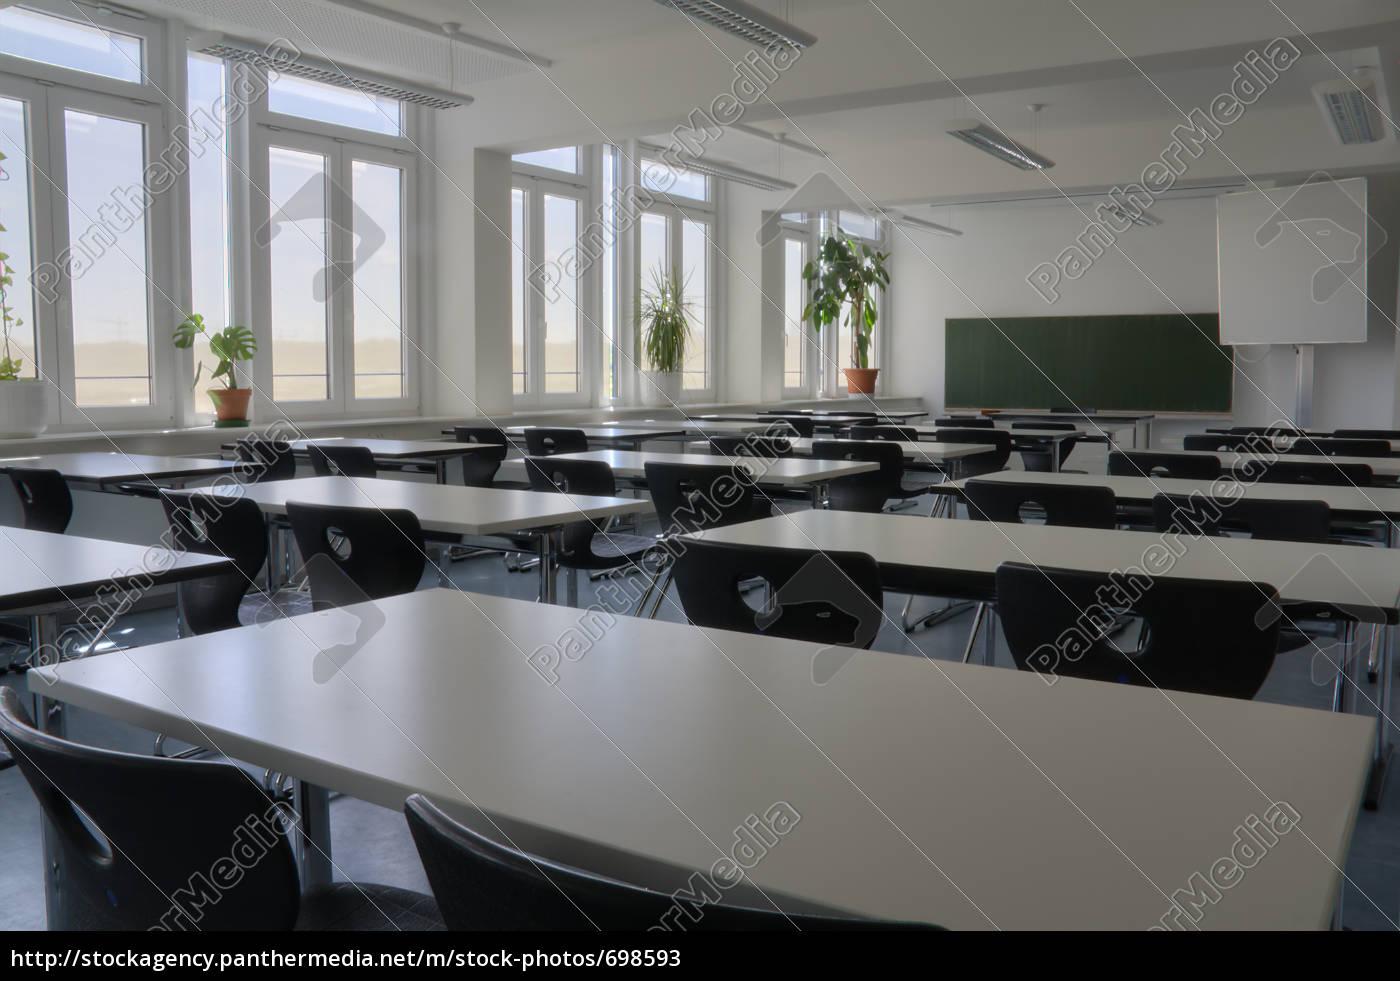 teaching, room - 698593